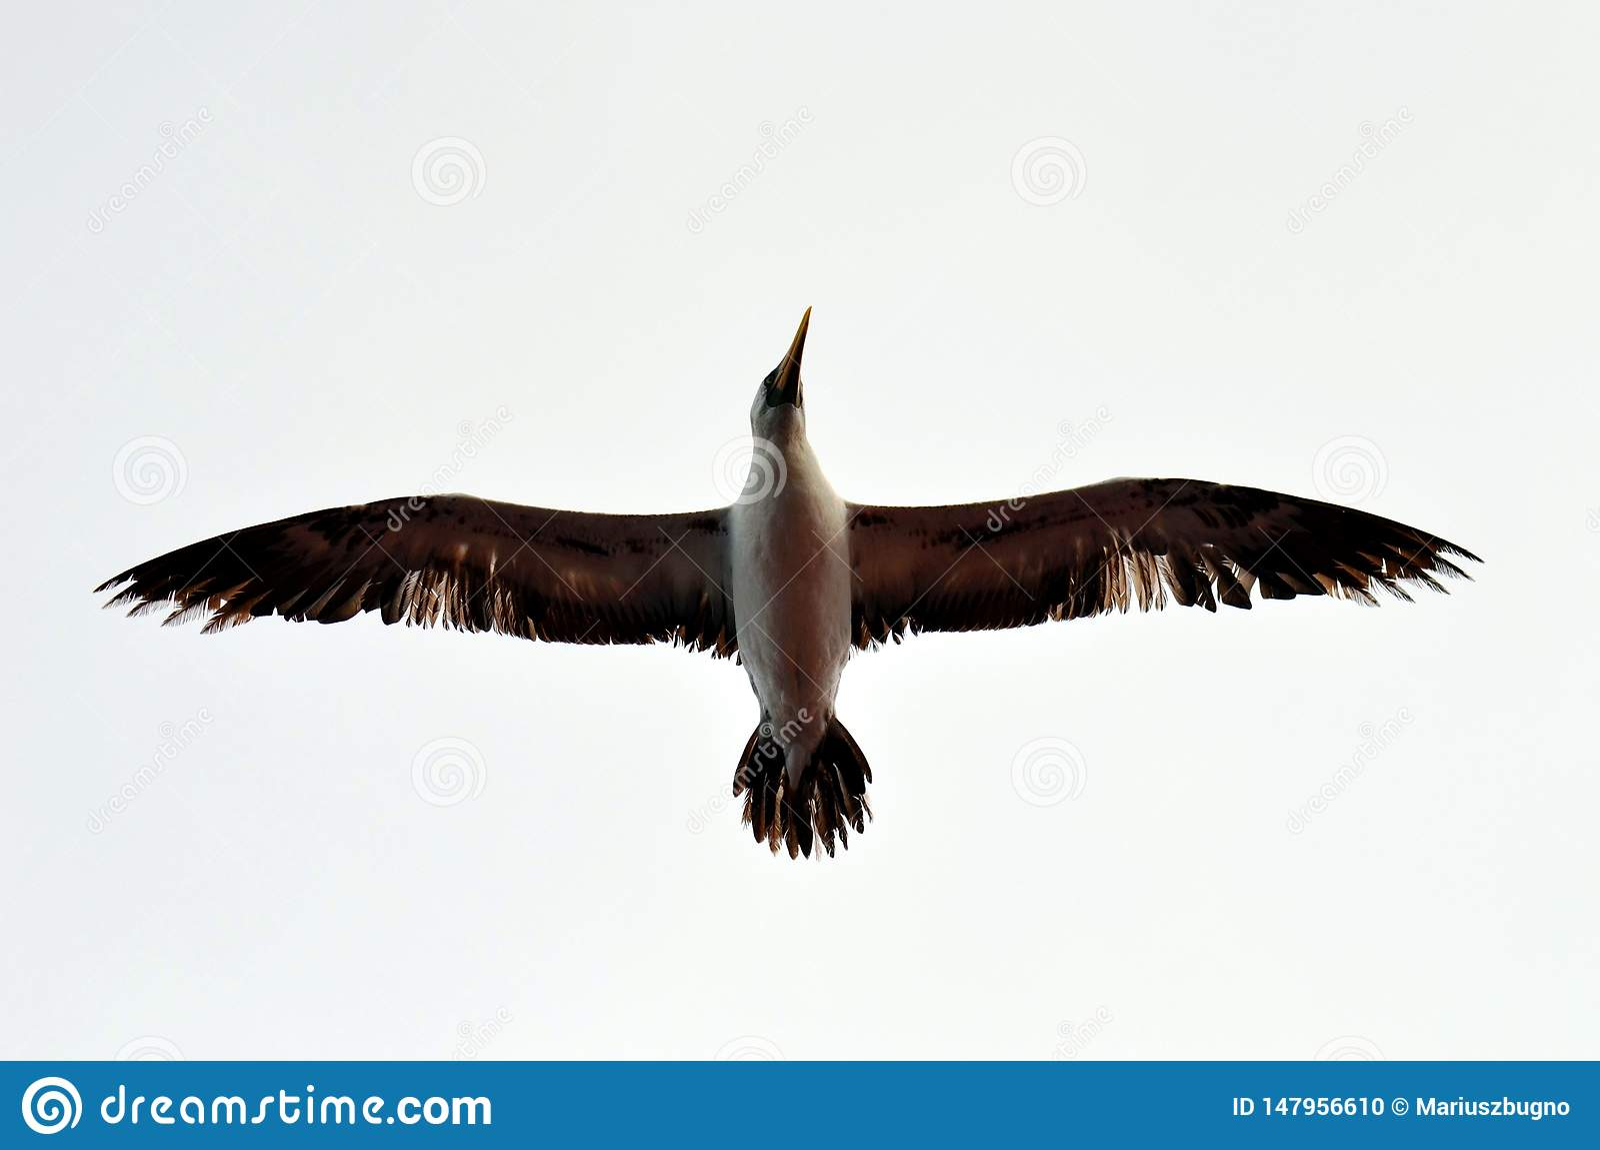 Vol de l oiseau marin au-dessus de l oc?an calme